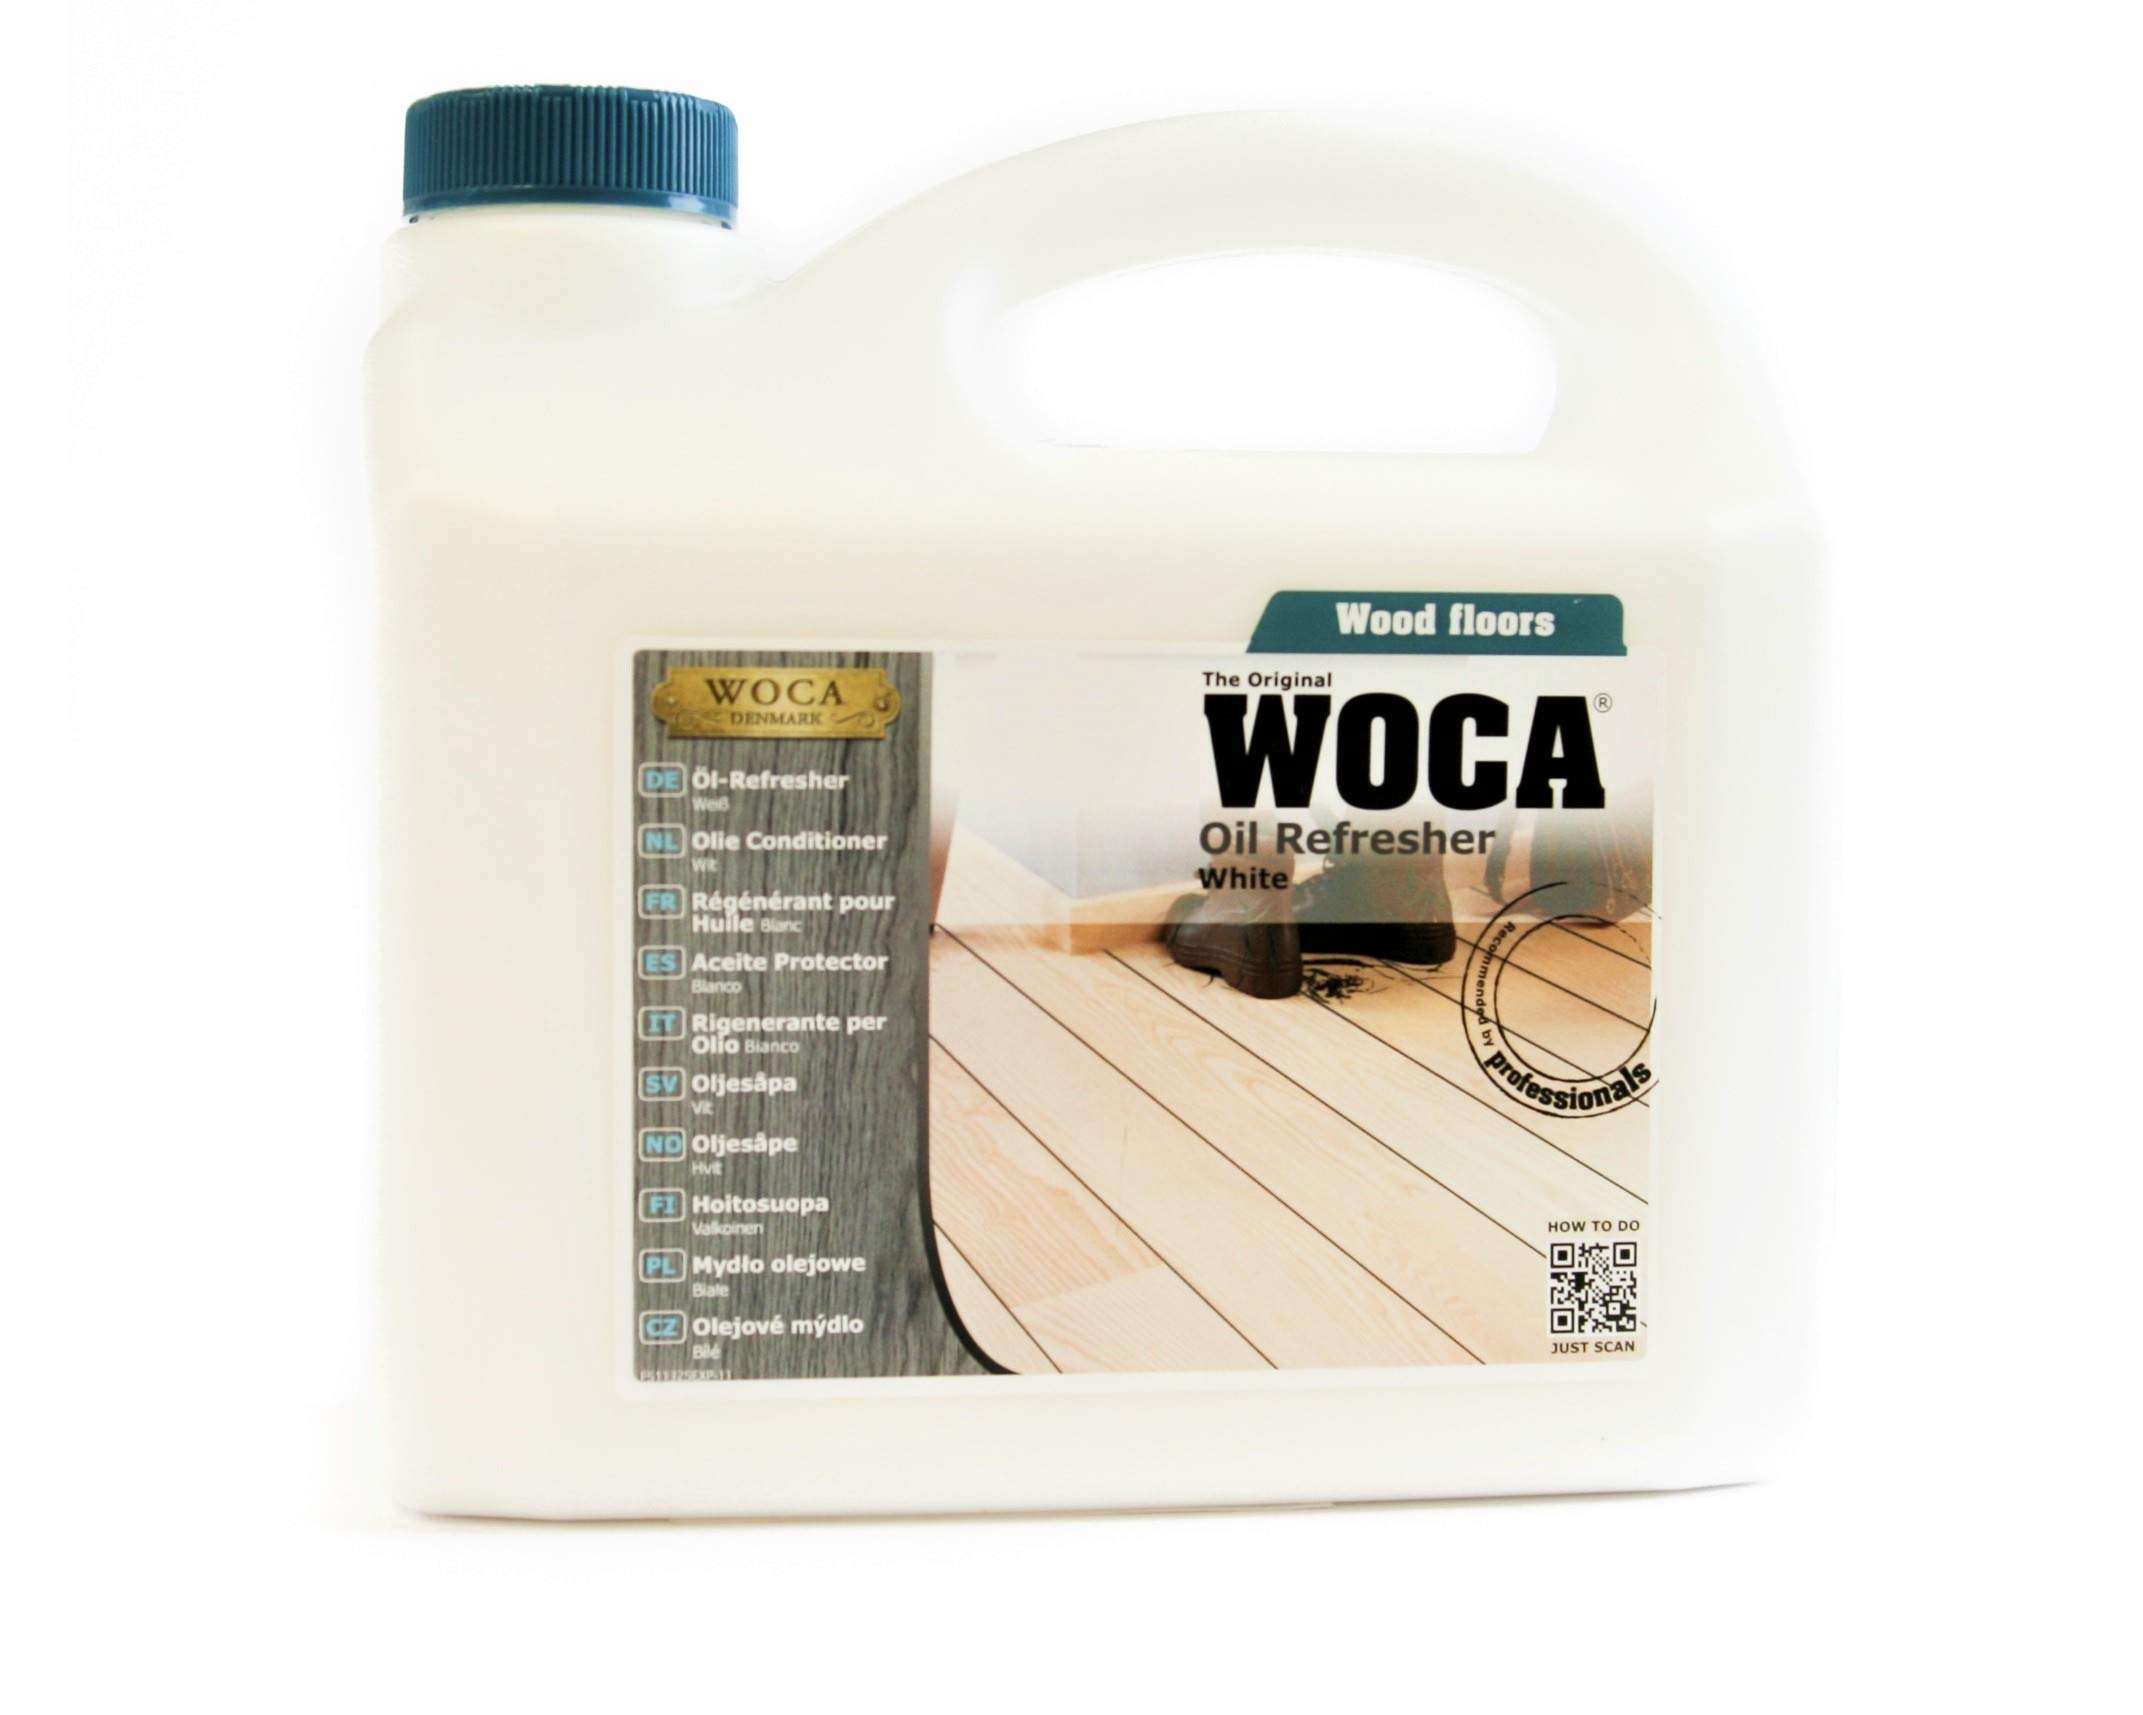 Woca Denmark the Original Oil Refresher White 2.5 liter by Woca Denmark